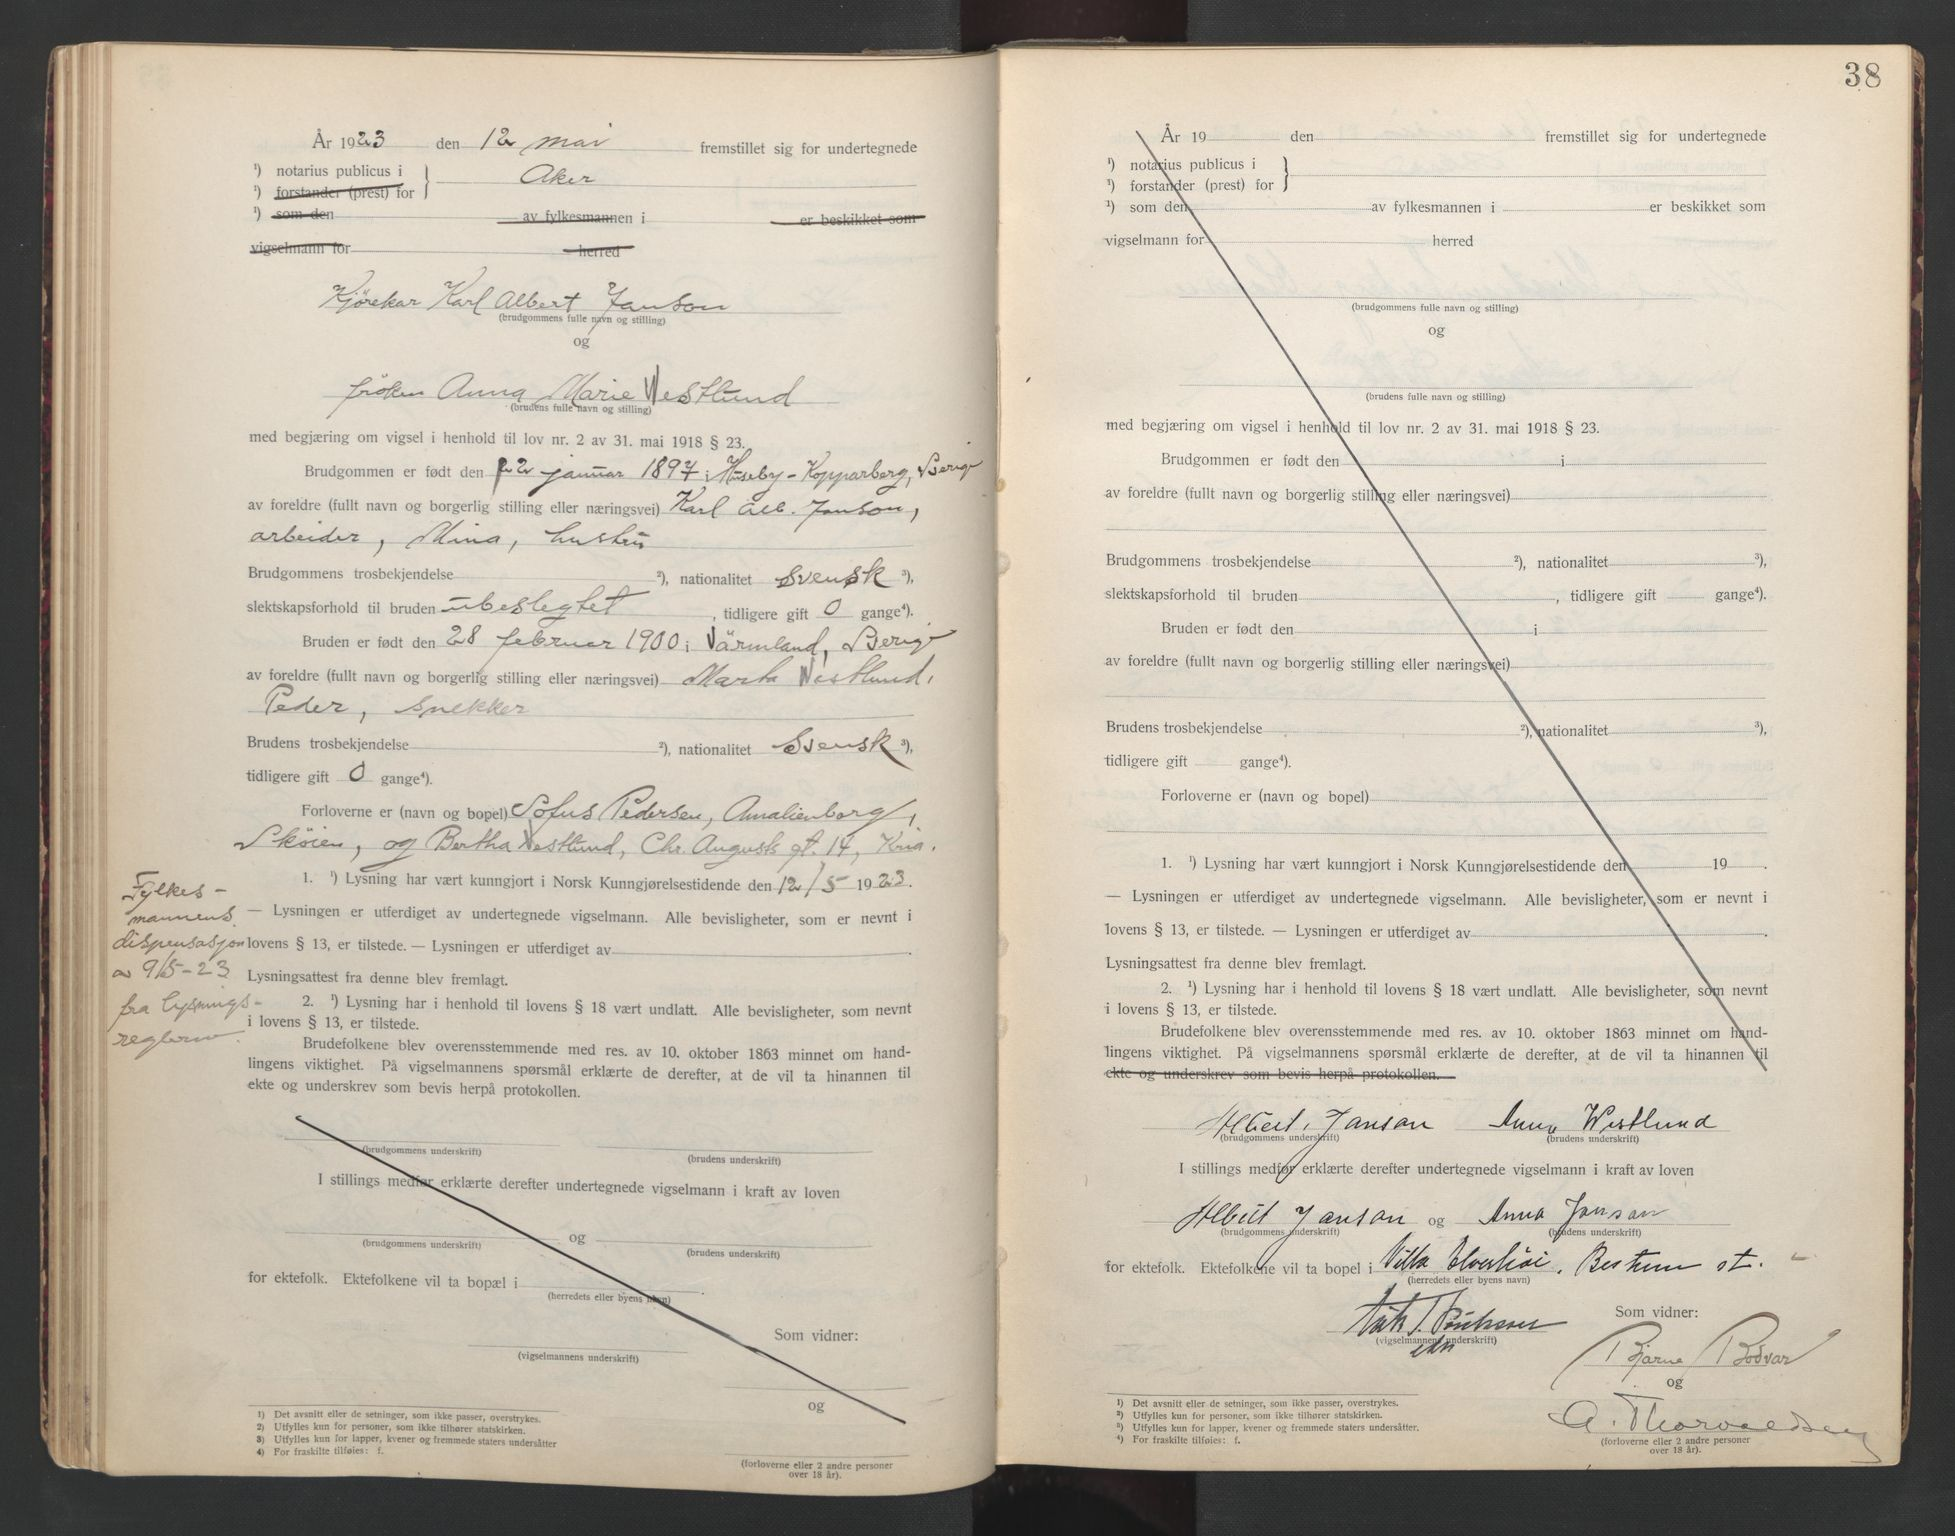 SAO, Aker sorenskriveri, L/Lc/Lcb/L0002: Vigselprotokoll, 1922-1924, s. 38